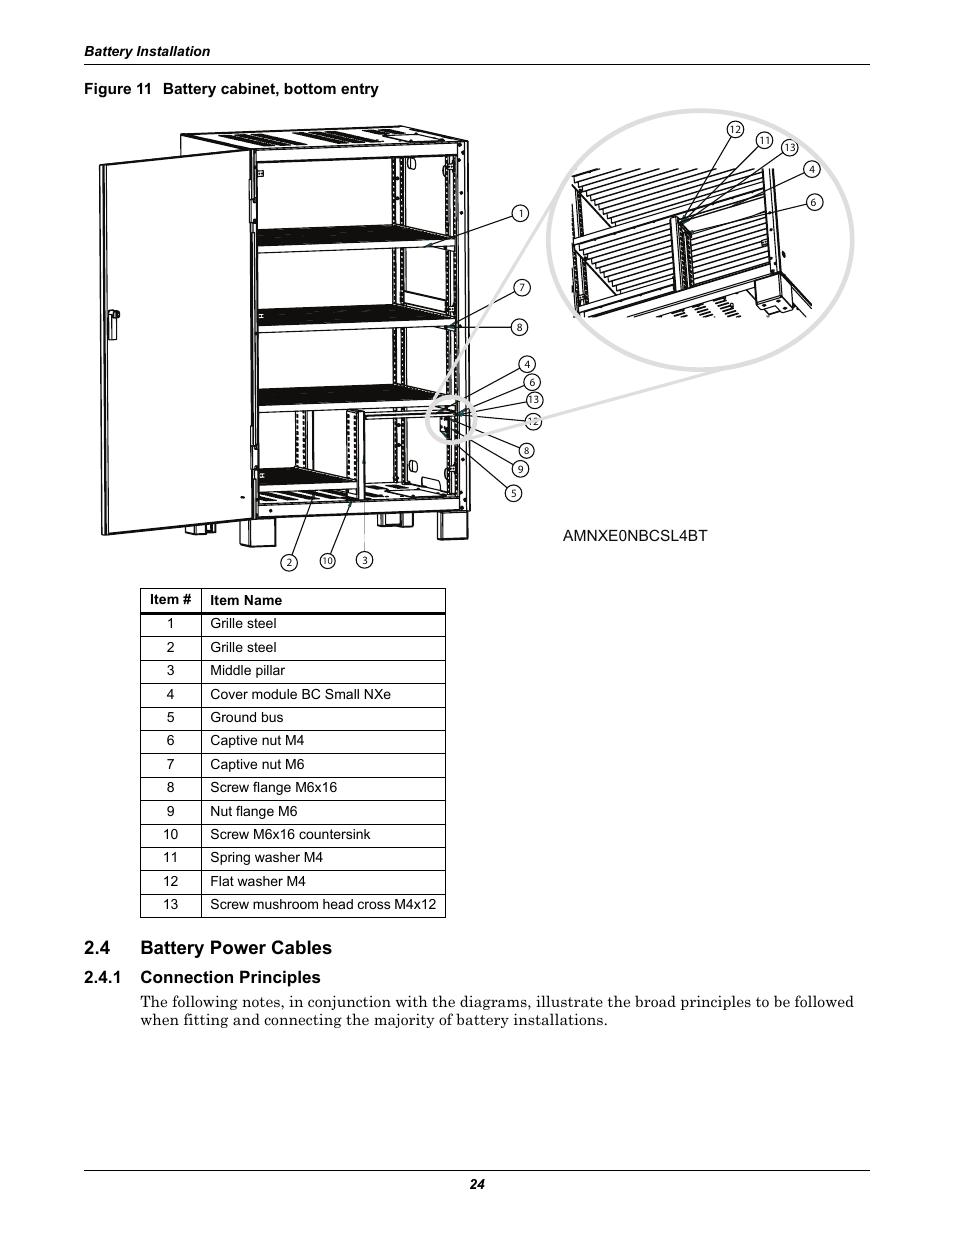 Figure 11 battery cabinet, bottom entry, 4 battery power